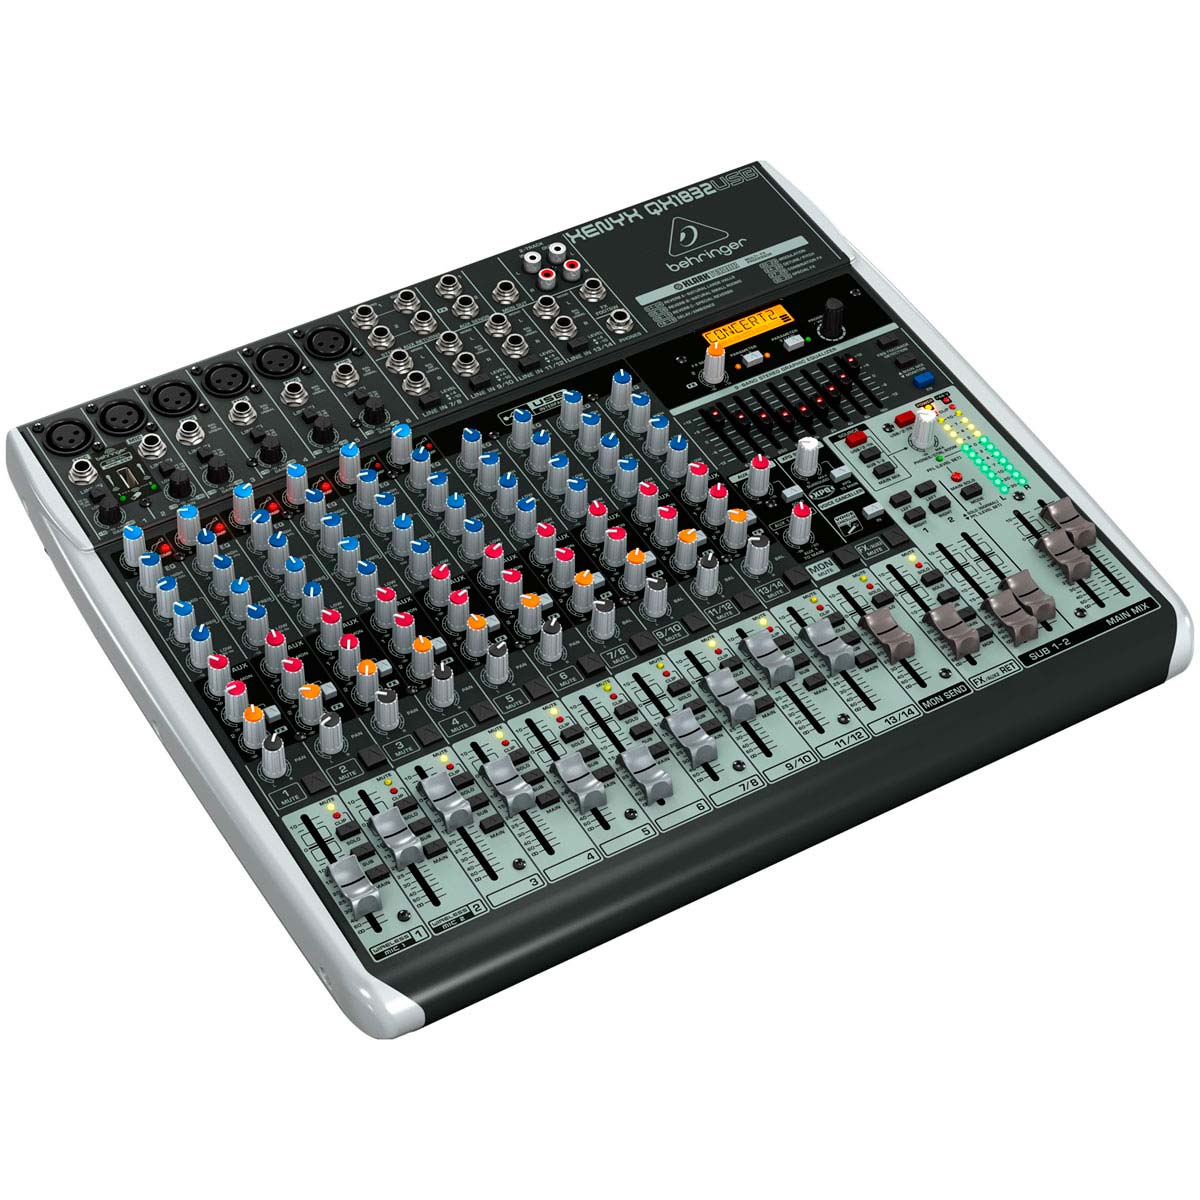 Mesa de Som 18 Canais Balanceados (6 XLR + 12 P10) c/ USB / Efeito / Phantom / 3 Auxiliares - Xenyx QX 1832 USB Behringer